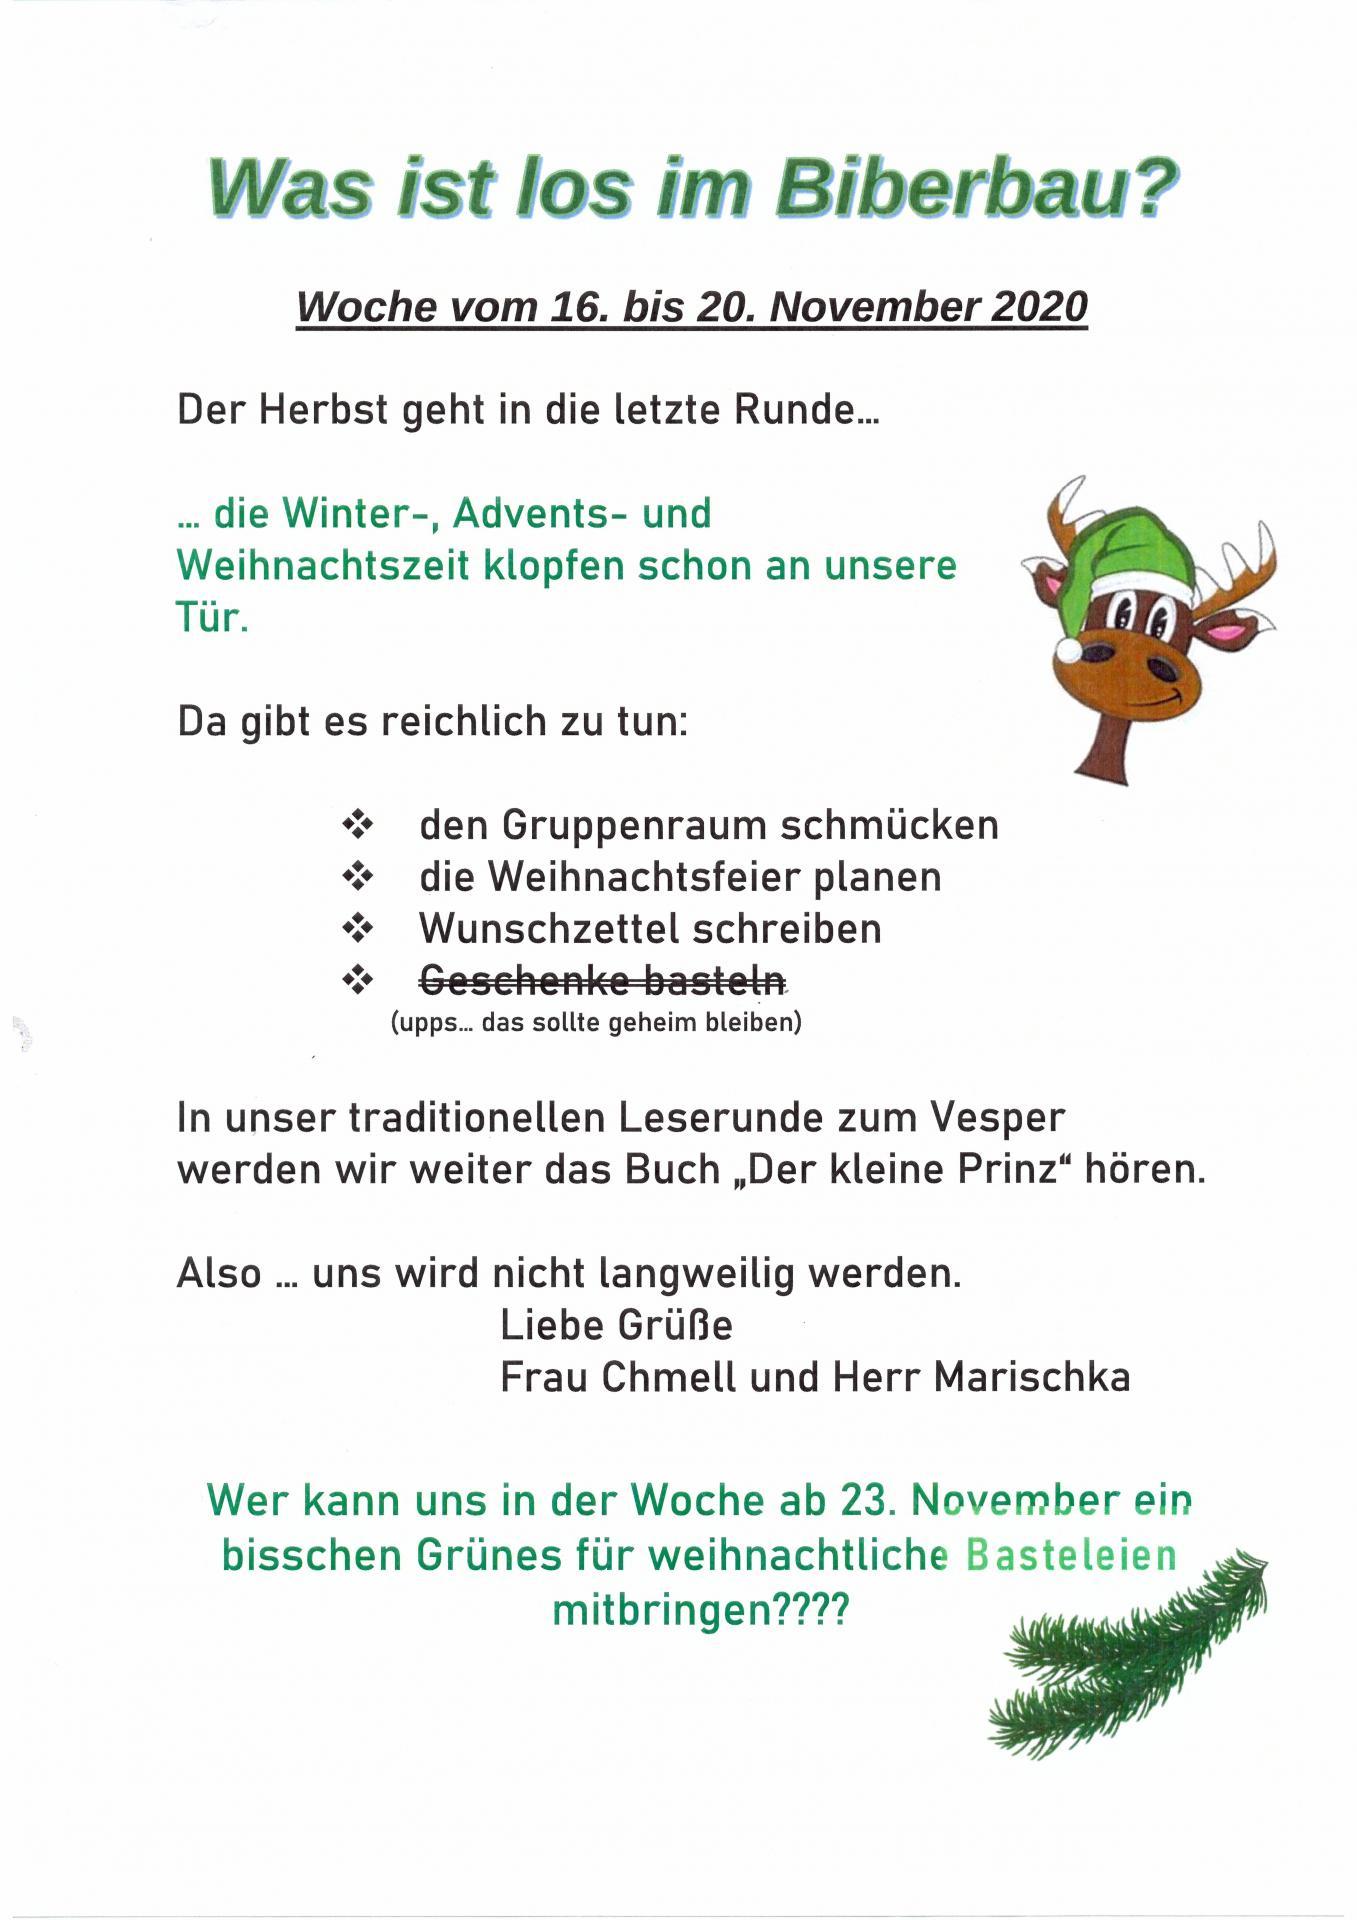 wochenplan Biber 16.11. - 20.11.